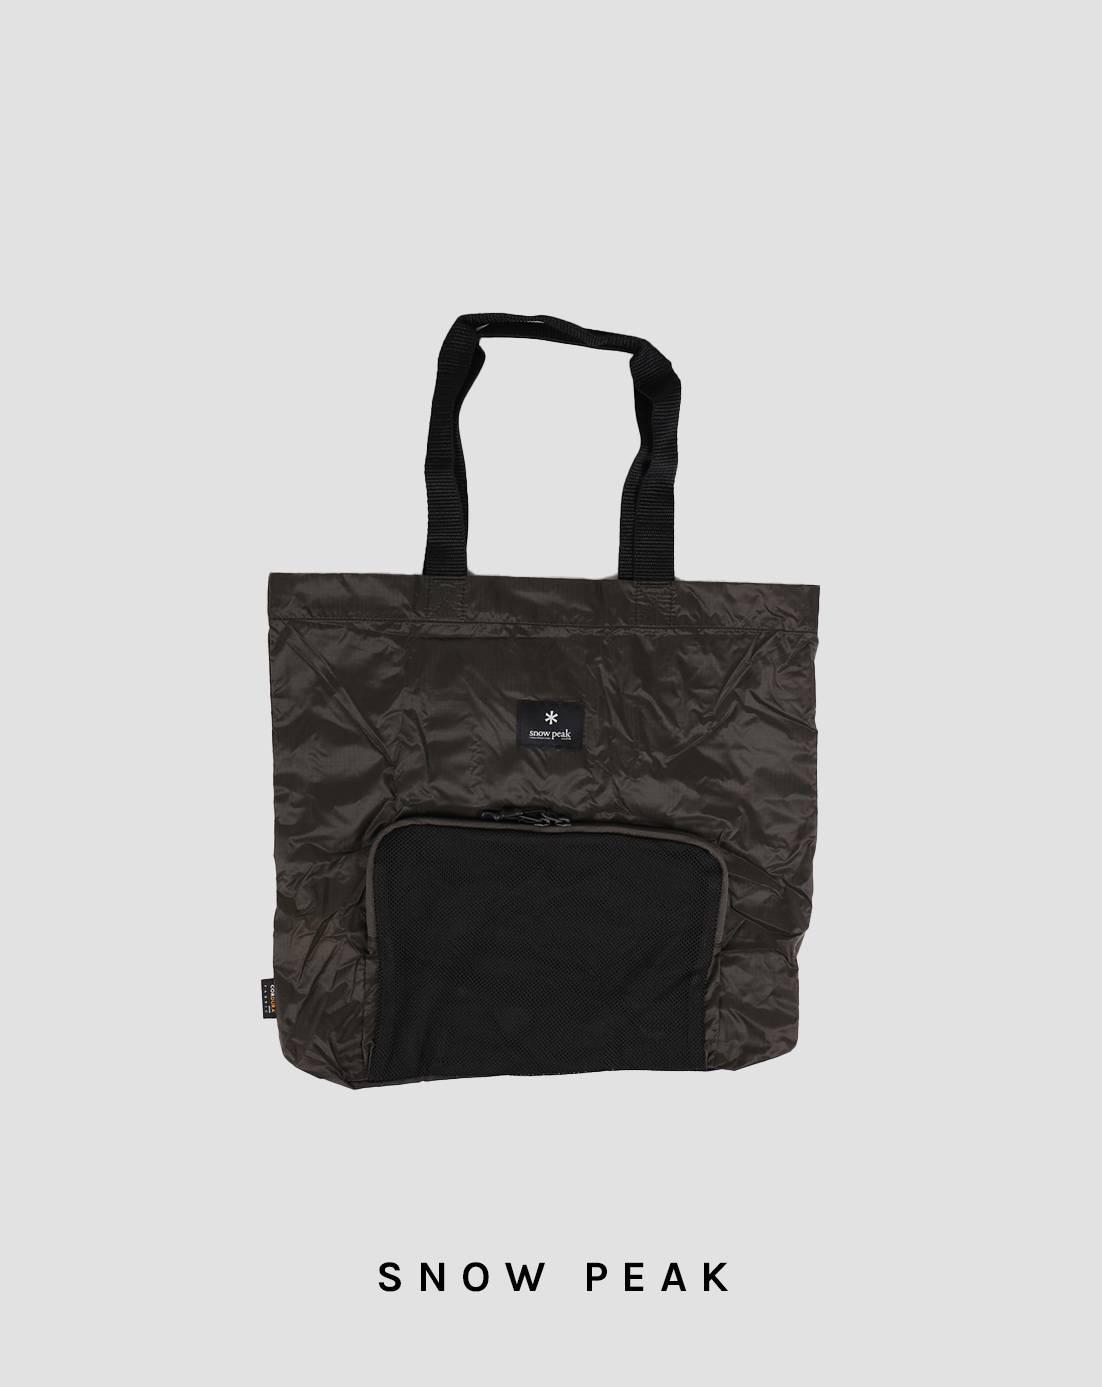 Snow Peak bag